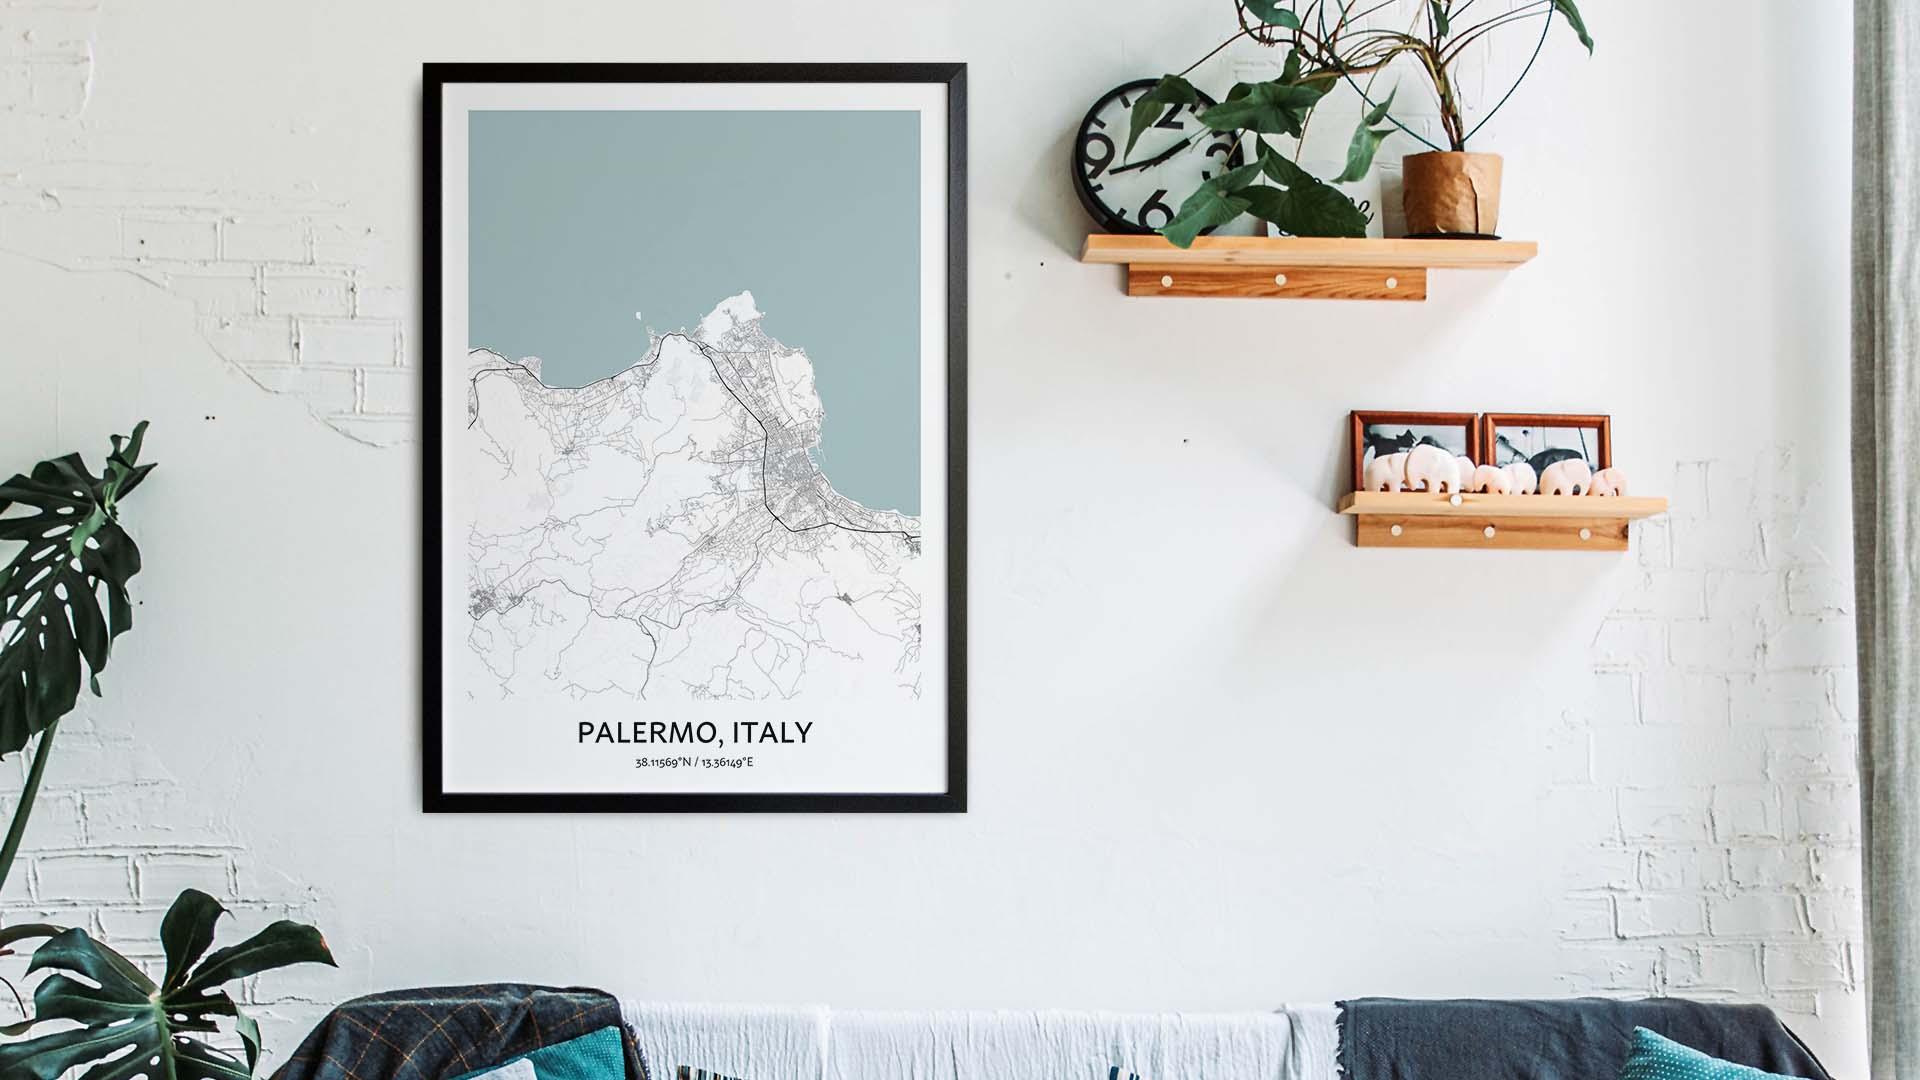 Palermo map art